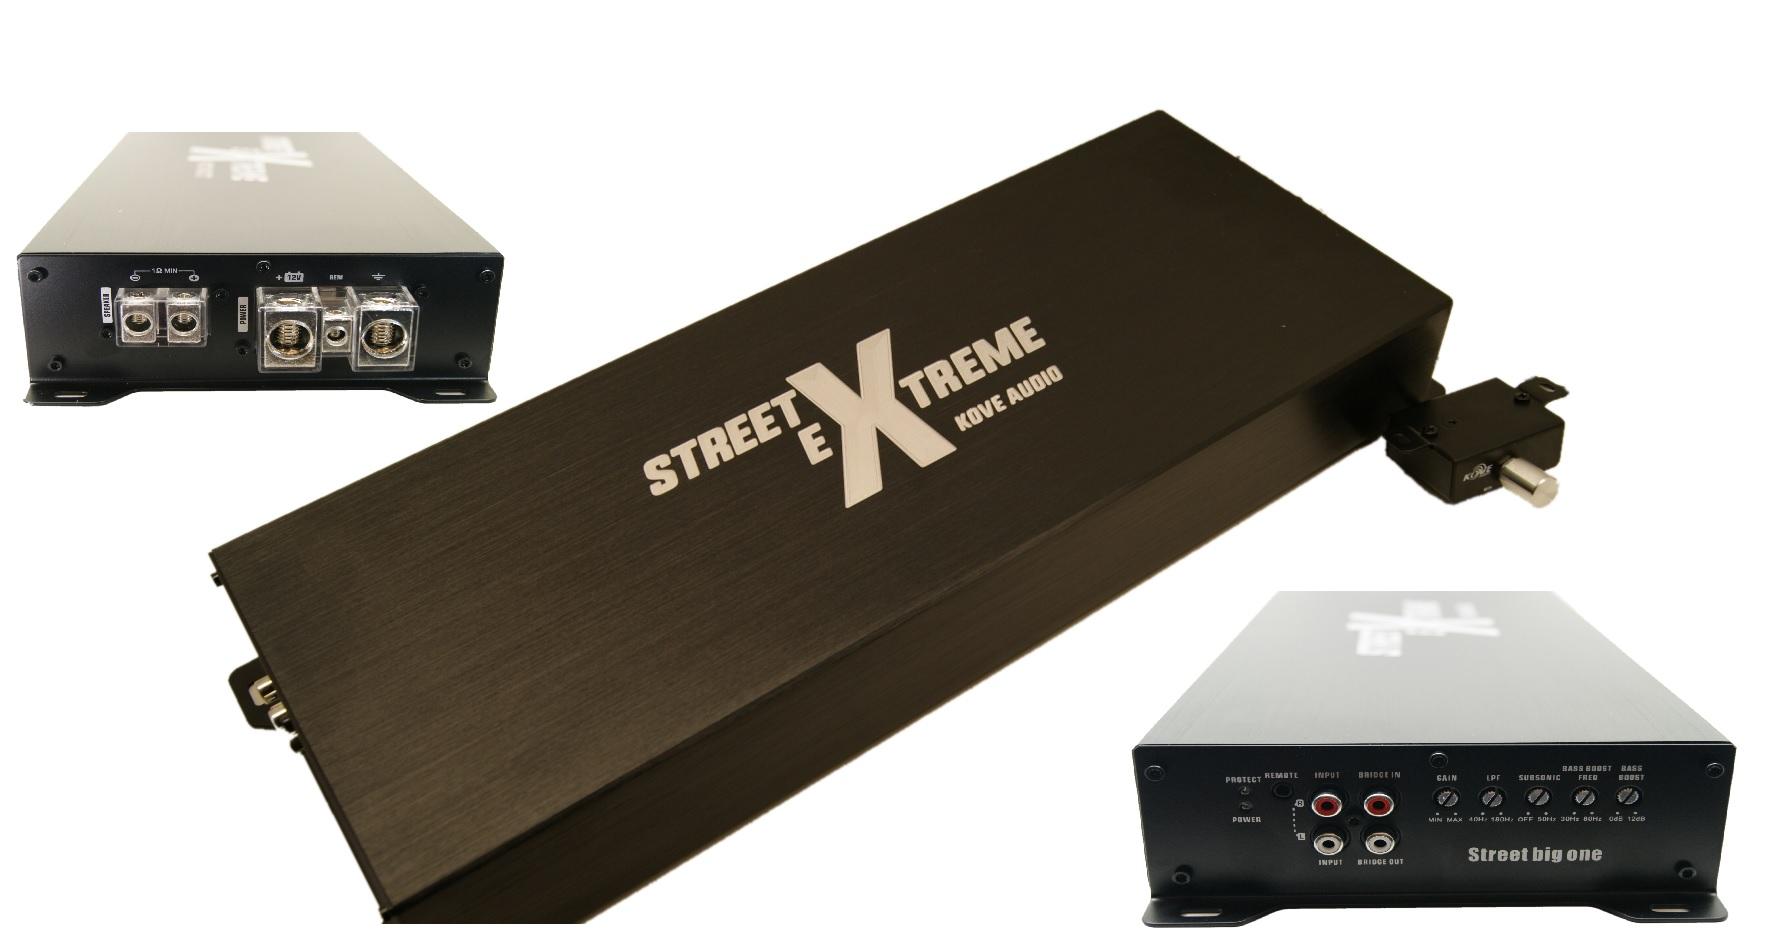 Street Extreme big one